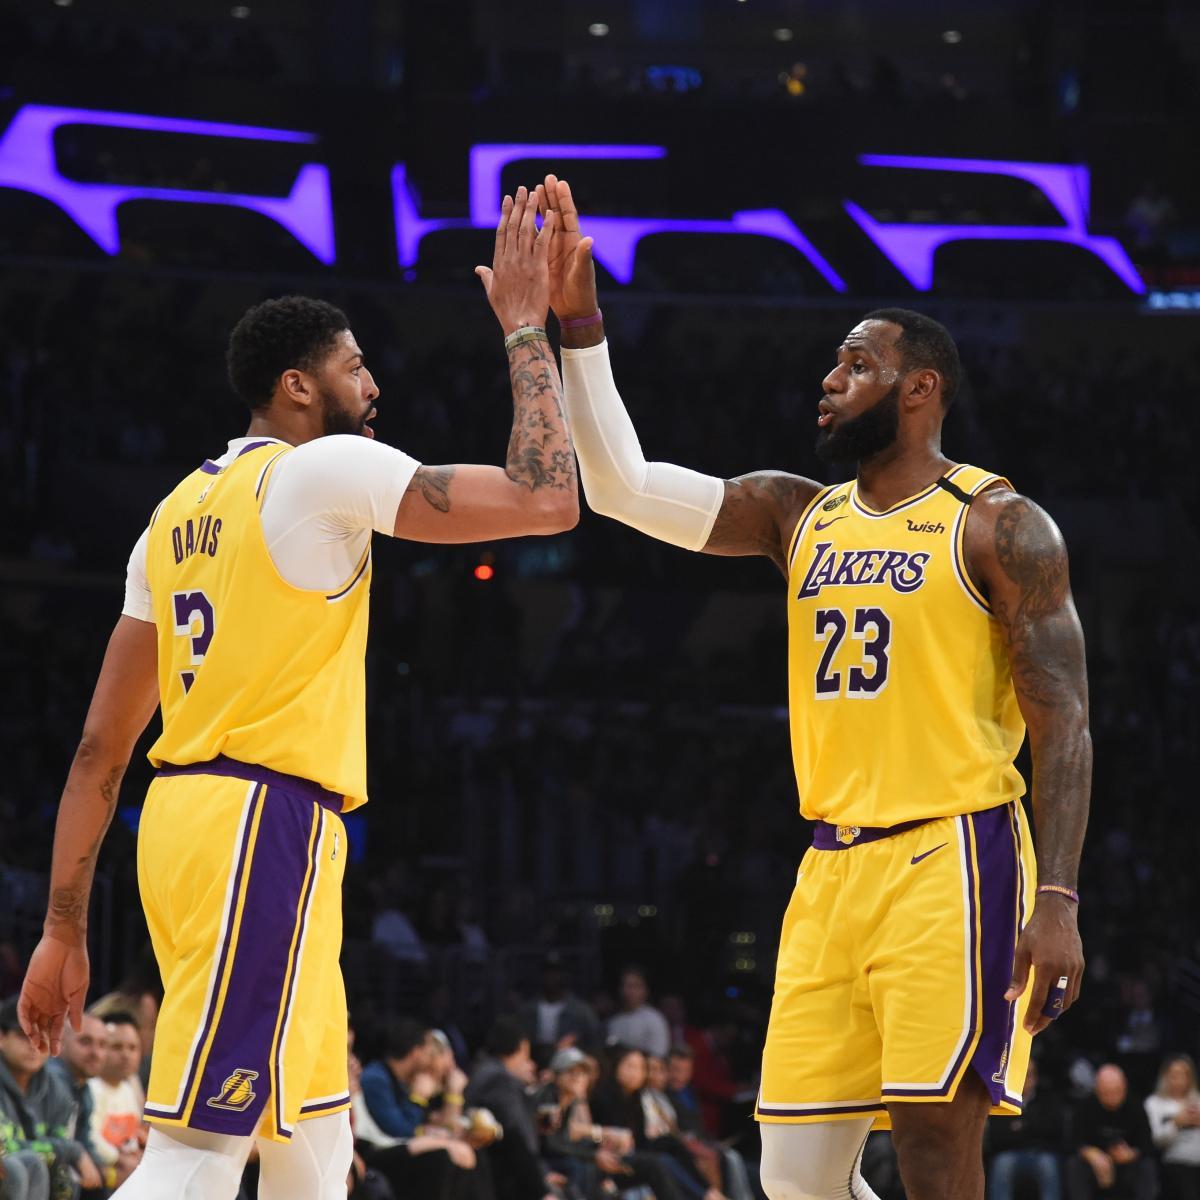 Lakers' LeBron James Praises Anthony Davis as NBA's DPOY After Win vs. Grizzlies